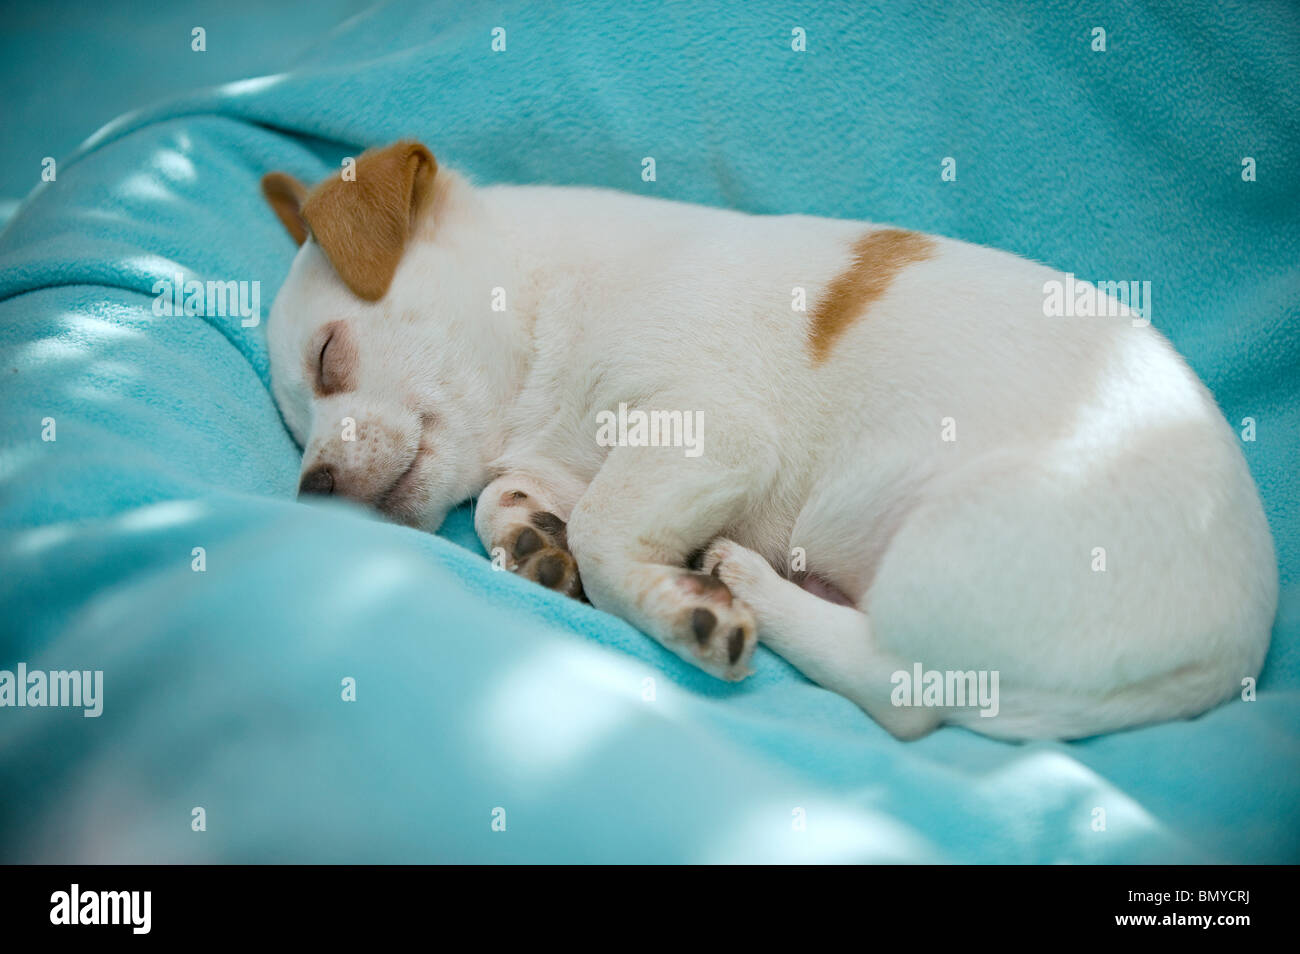 half breed dog puppy sleeping - Stock Image